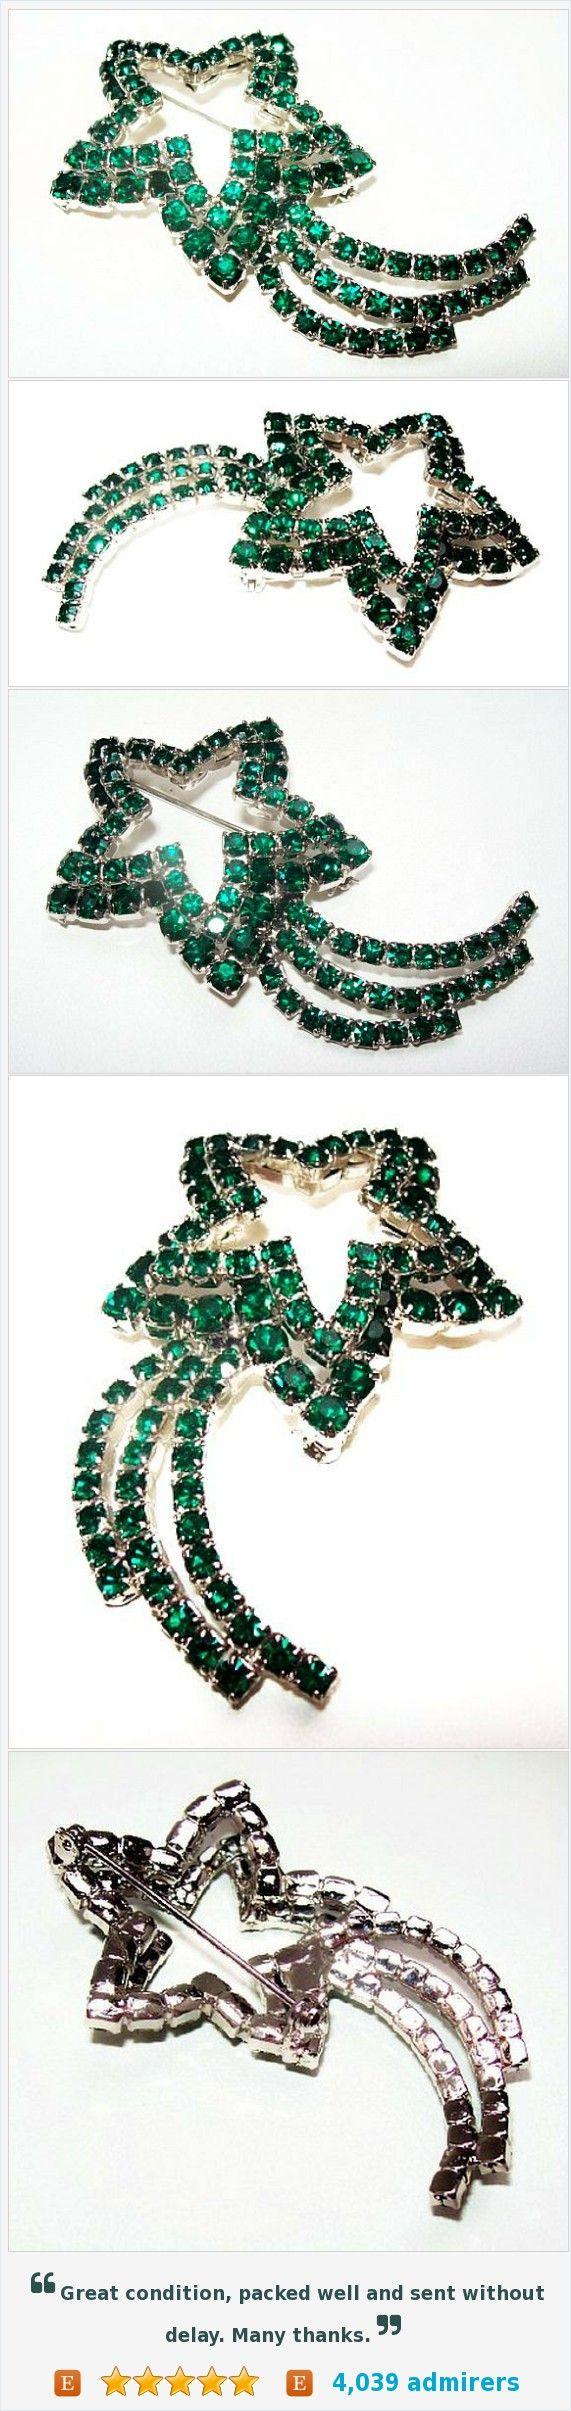 "Green Shooting Star Brooch Layered Round Rhinestones Silver Metal May BS Granny Chic BIG 2 3/4"" Vintage https://www.etsy.com/listing/462427594/"